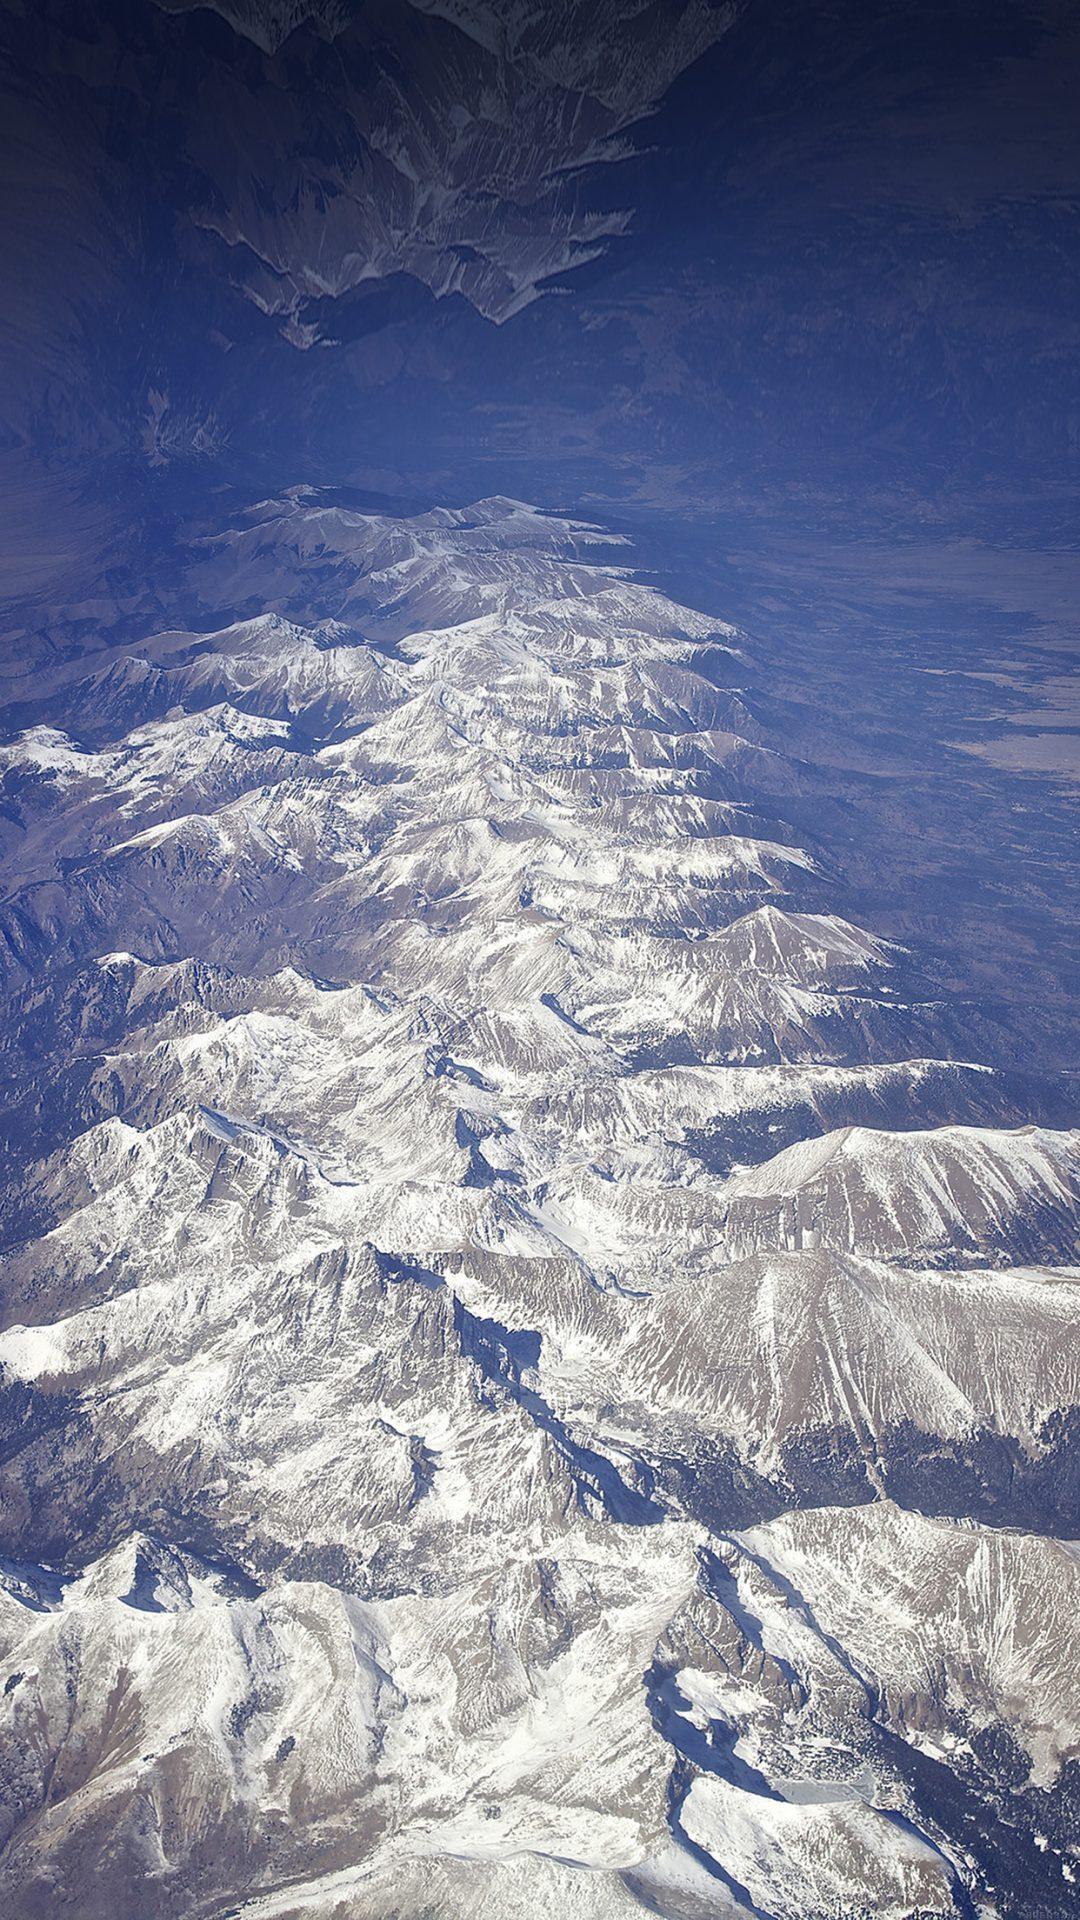 Earth Reversed Stellar Nature Snow Winter